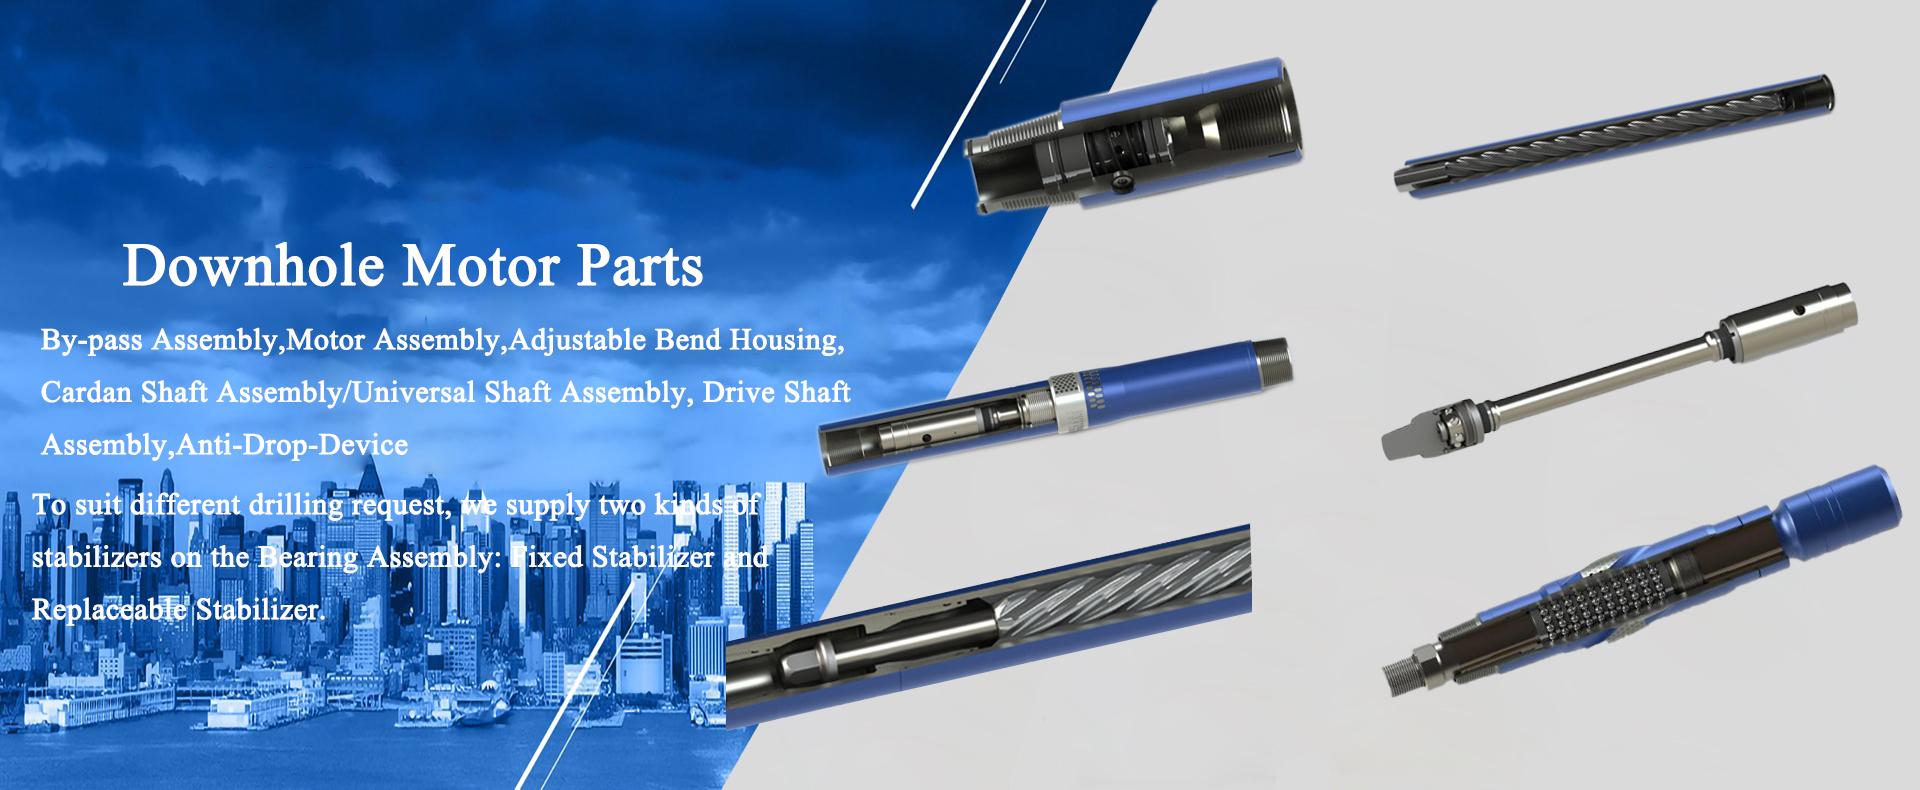 Downhole Motor Parts